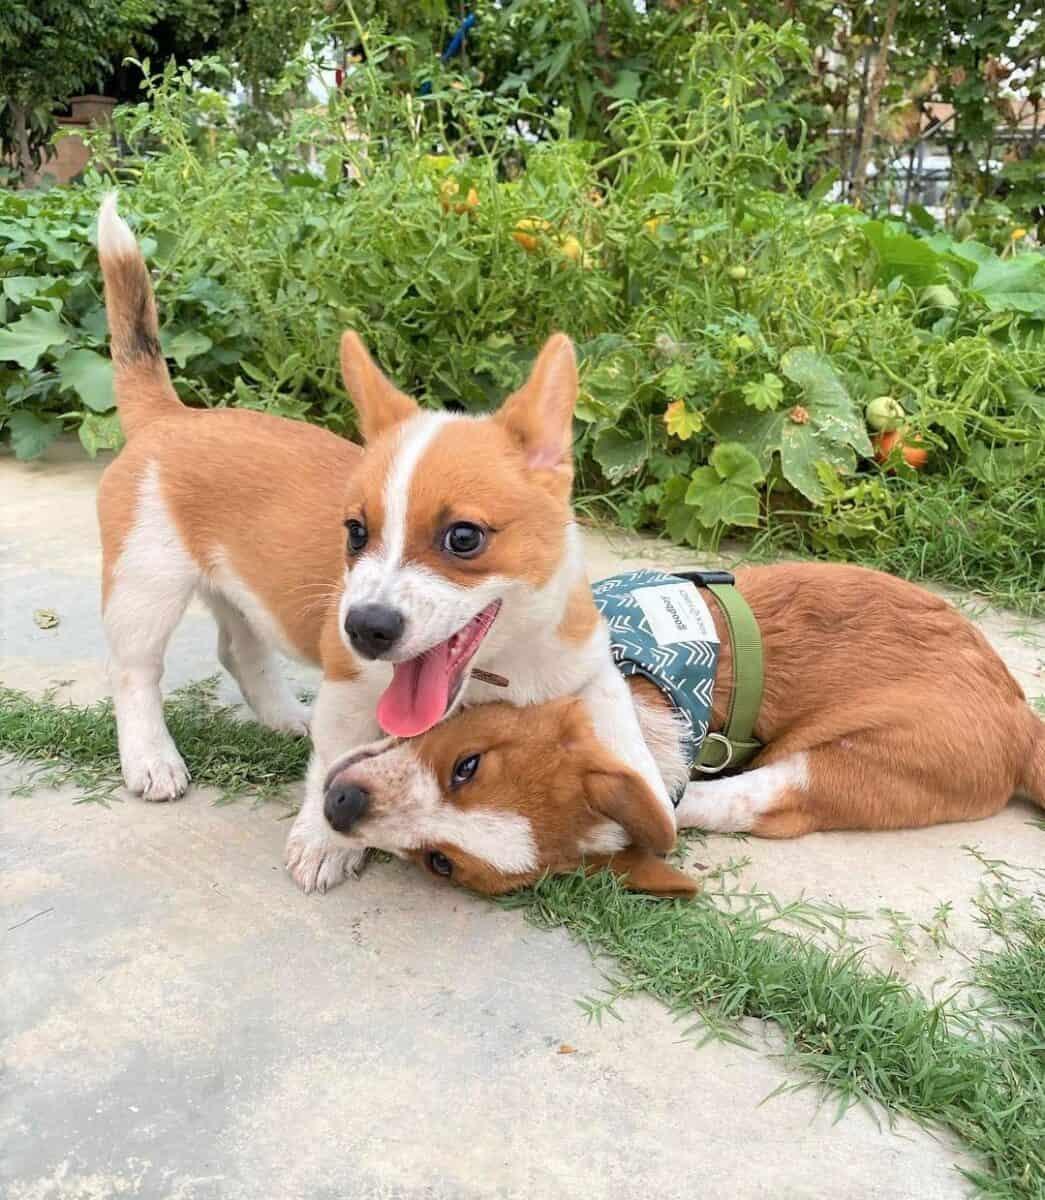 Two Cowboy Corgi puppies playing together